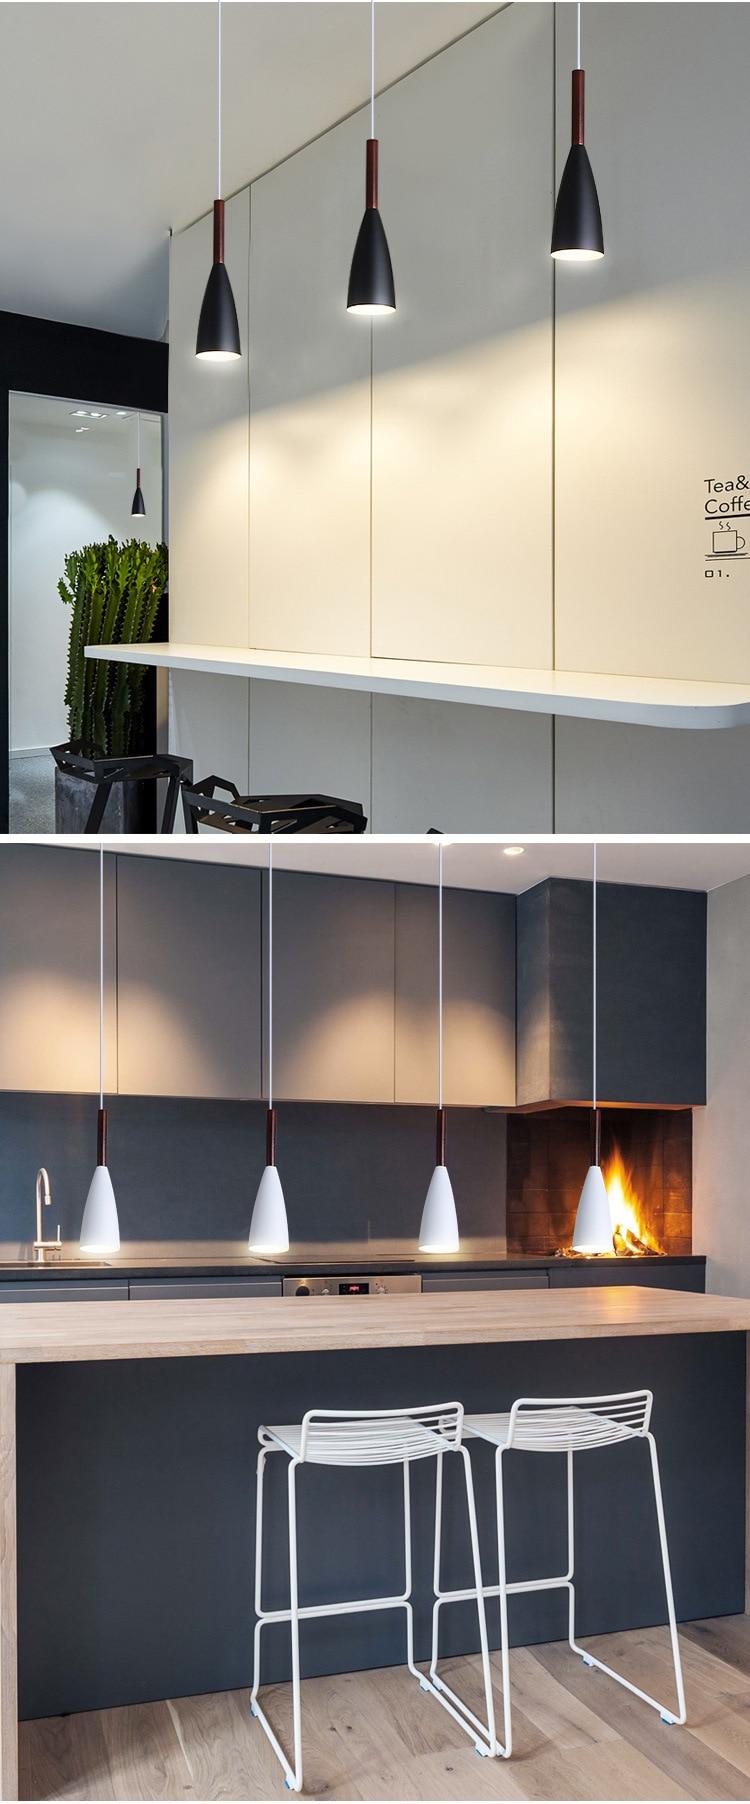 LuKLoy Modern Pendant Light Kitchen Hanging Lamp Dining Room Kitchen Lighting Fixture Loft Decor Wood Hanglamp luminaire Lustre (22)